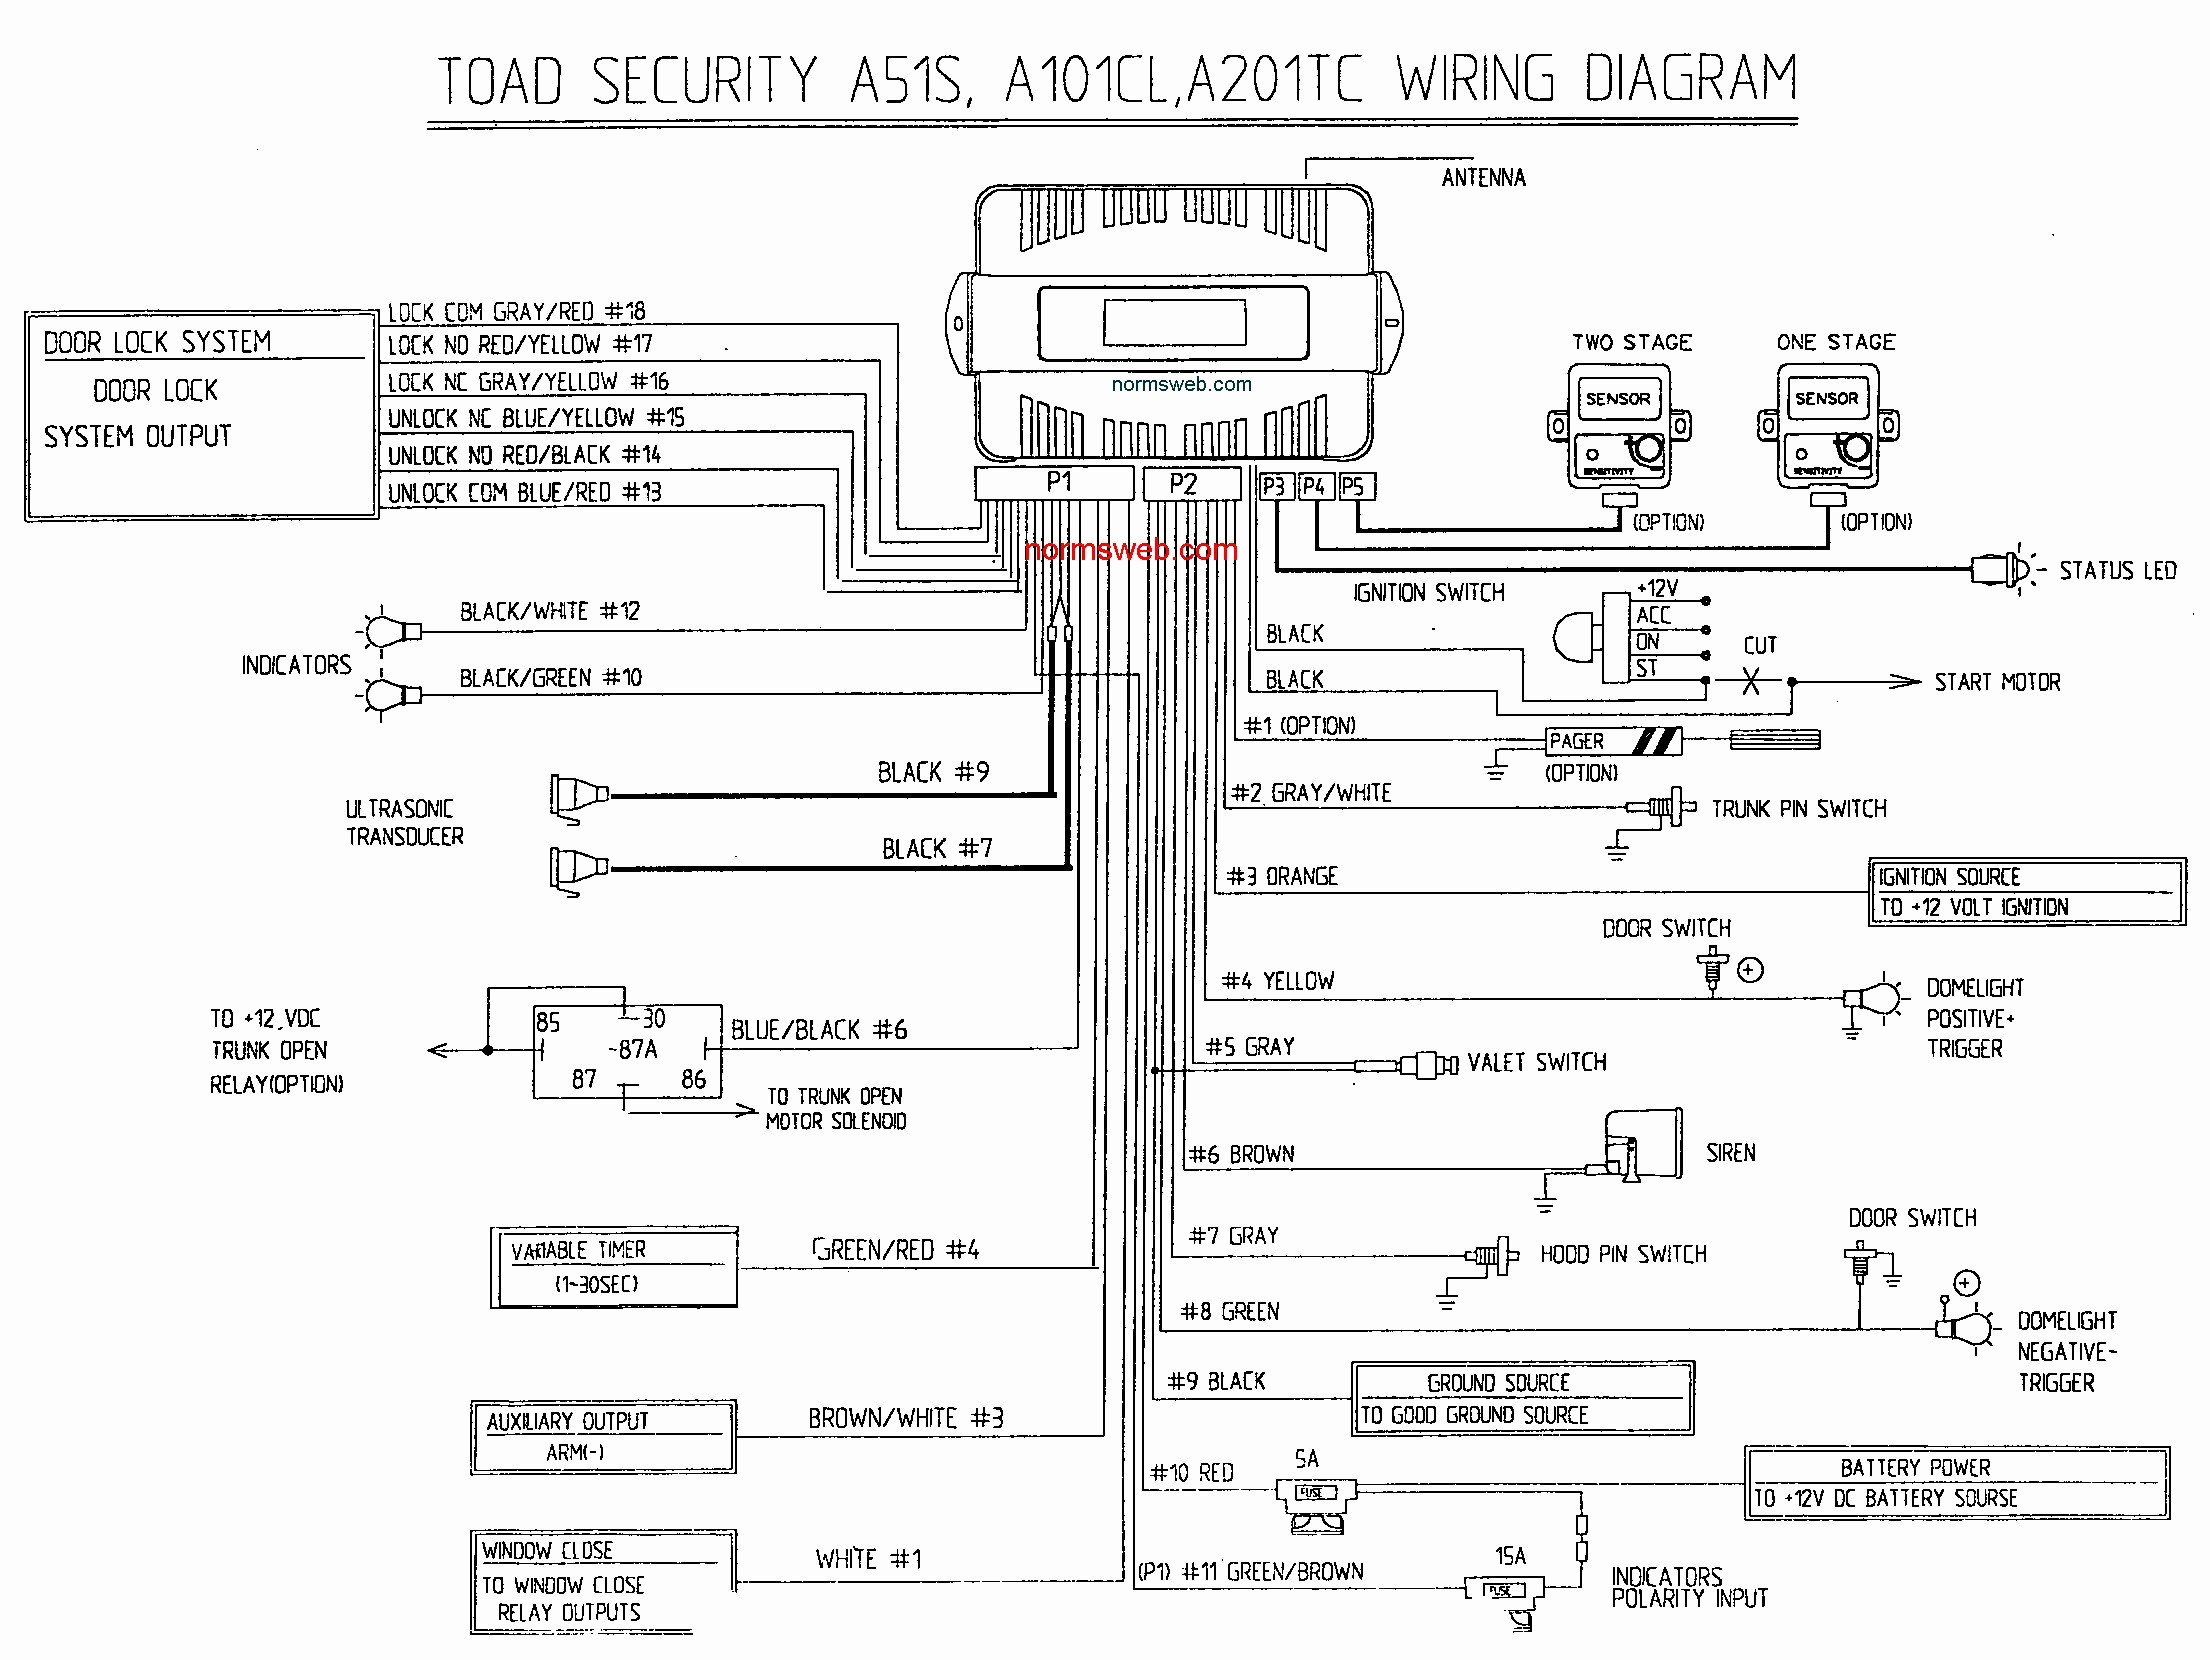 Bulldog Security Remote Starter Wiring Diagram - Zookastar - Bulldog Security Wiring Diagram